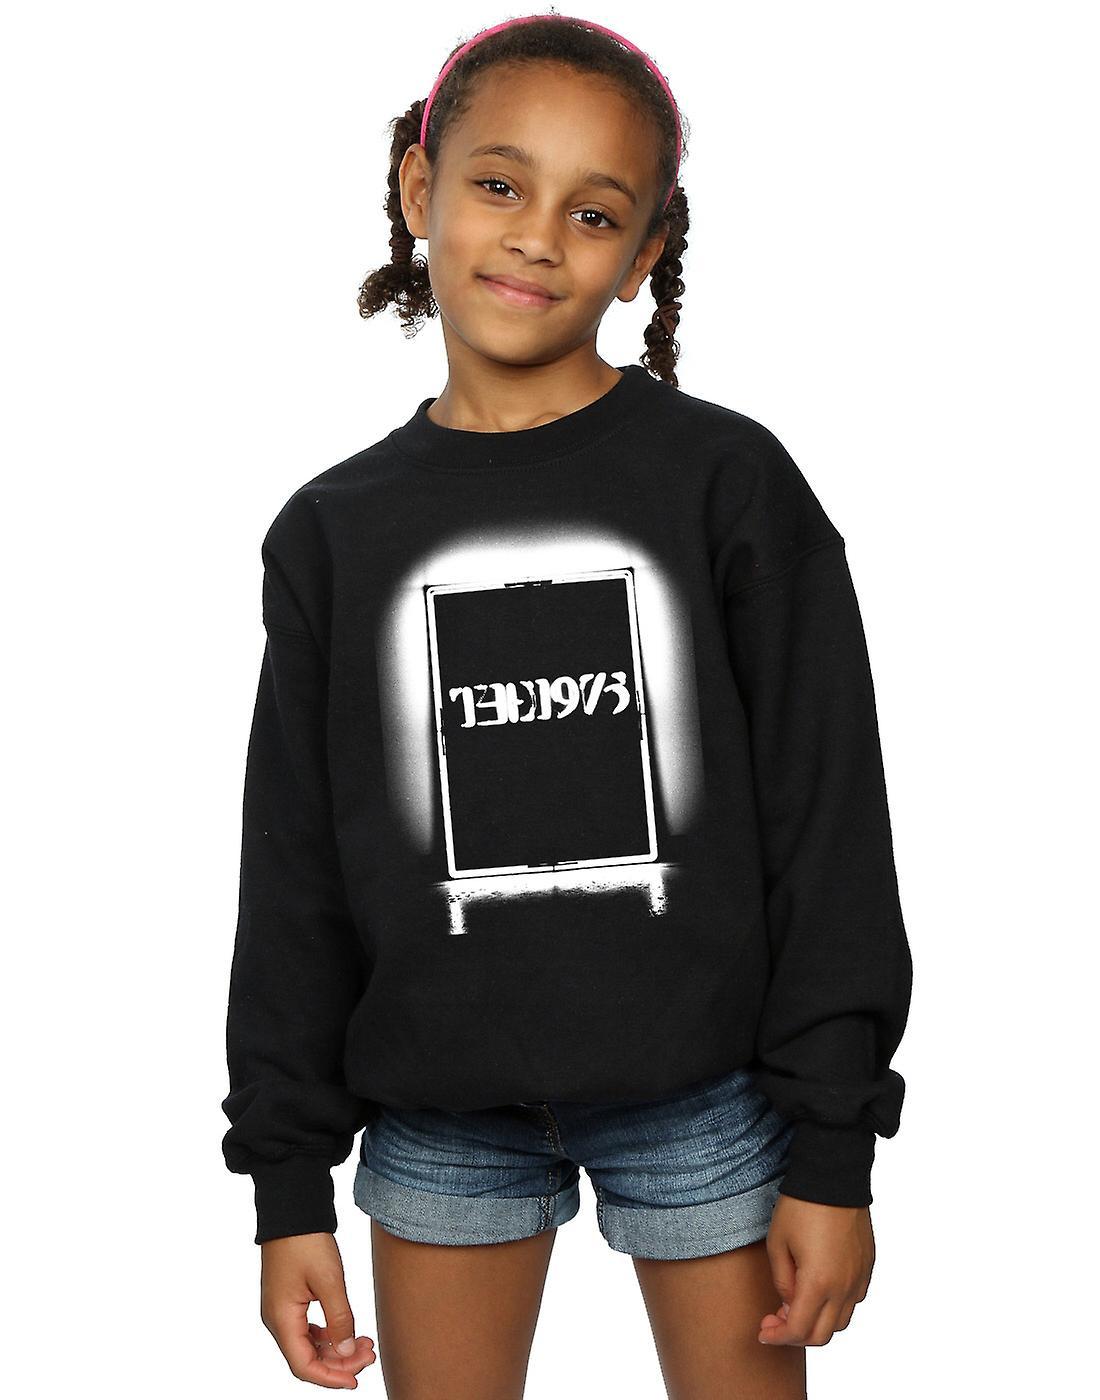 The 1975 Girls Black Tour Sweatshirt